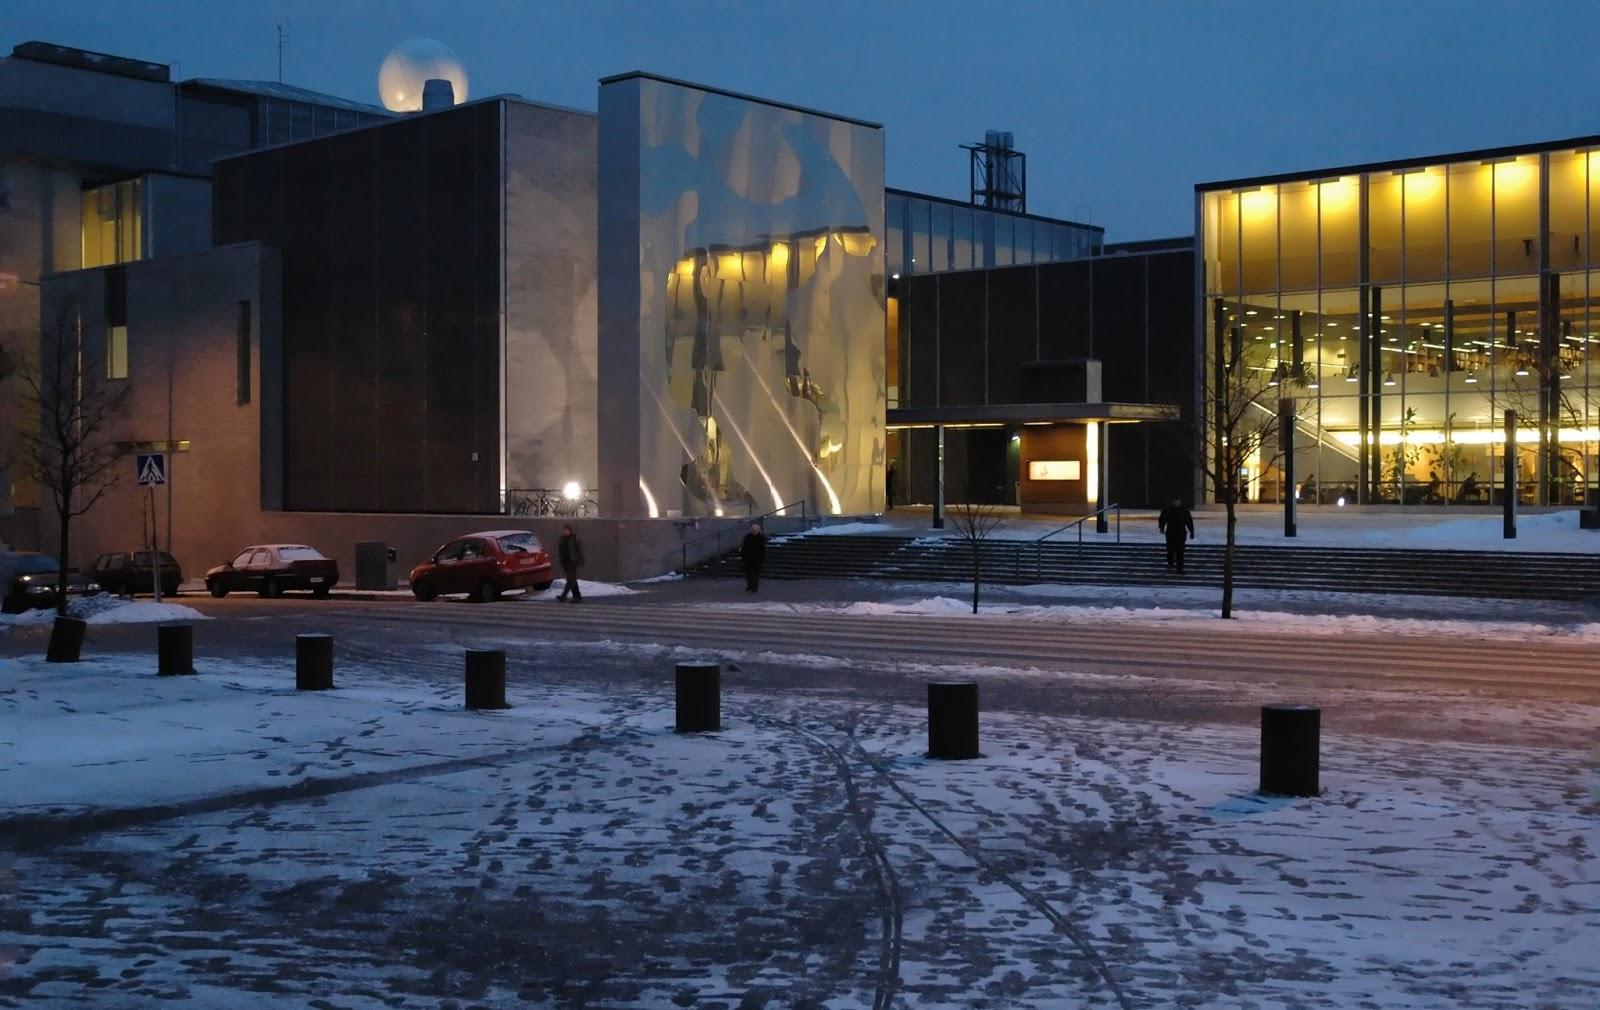 Kumpula Helsinki